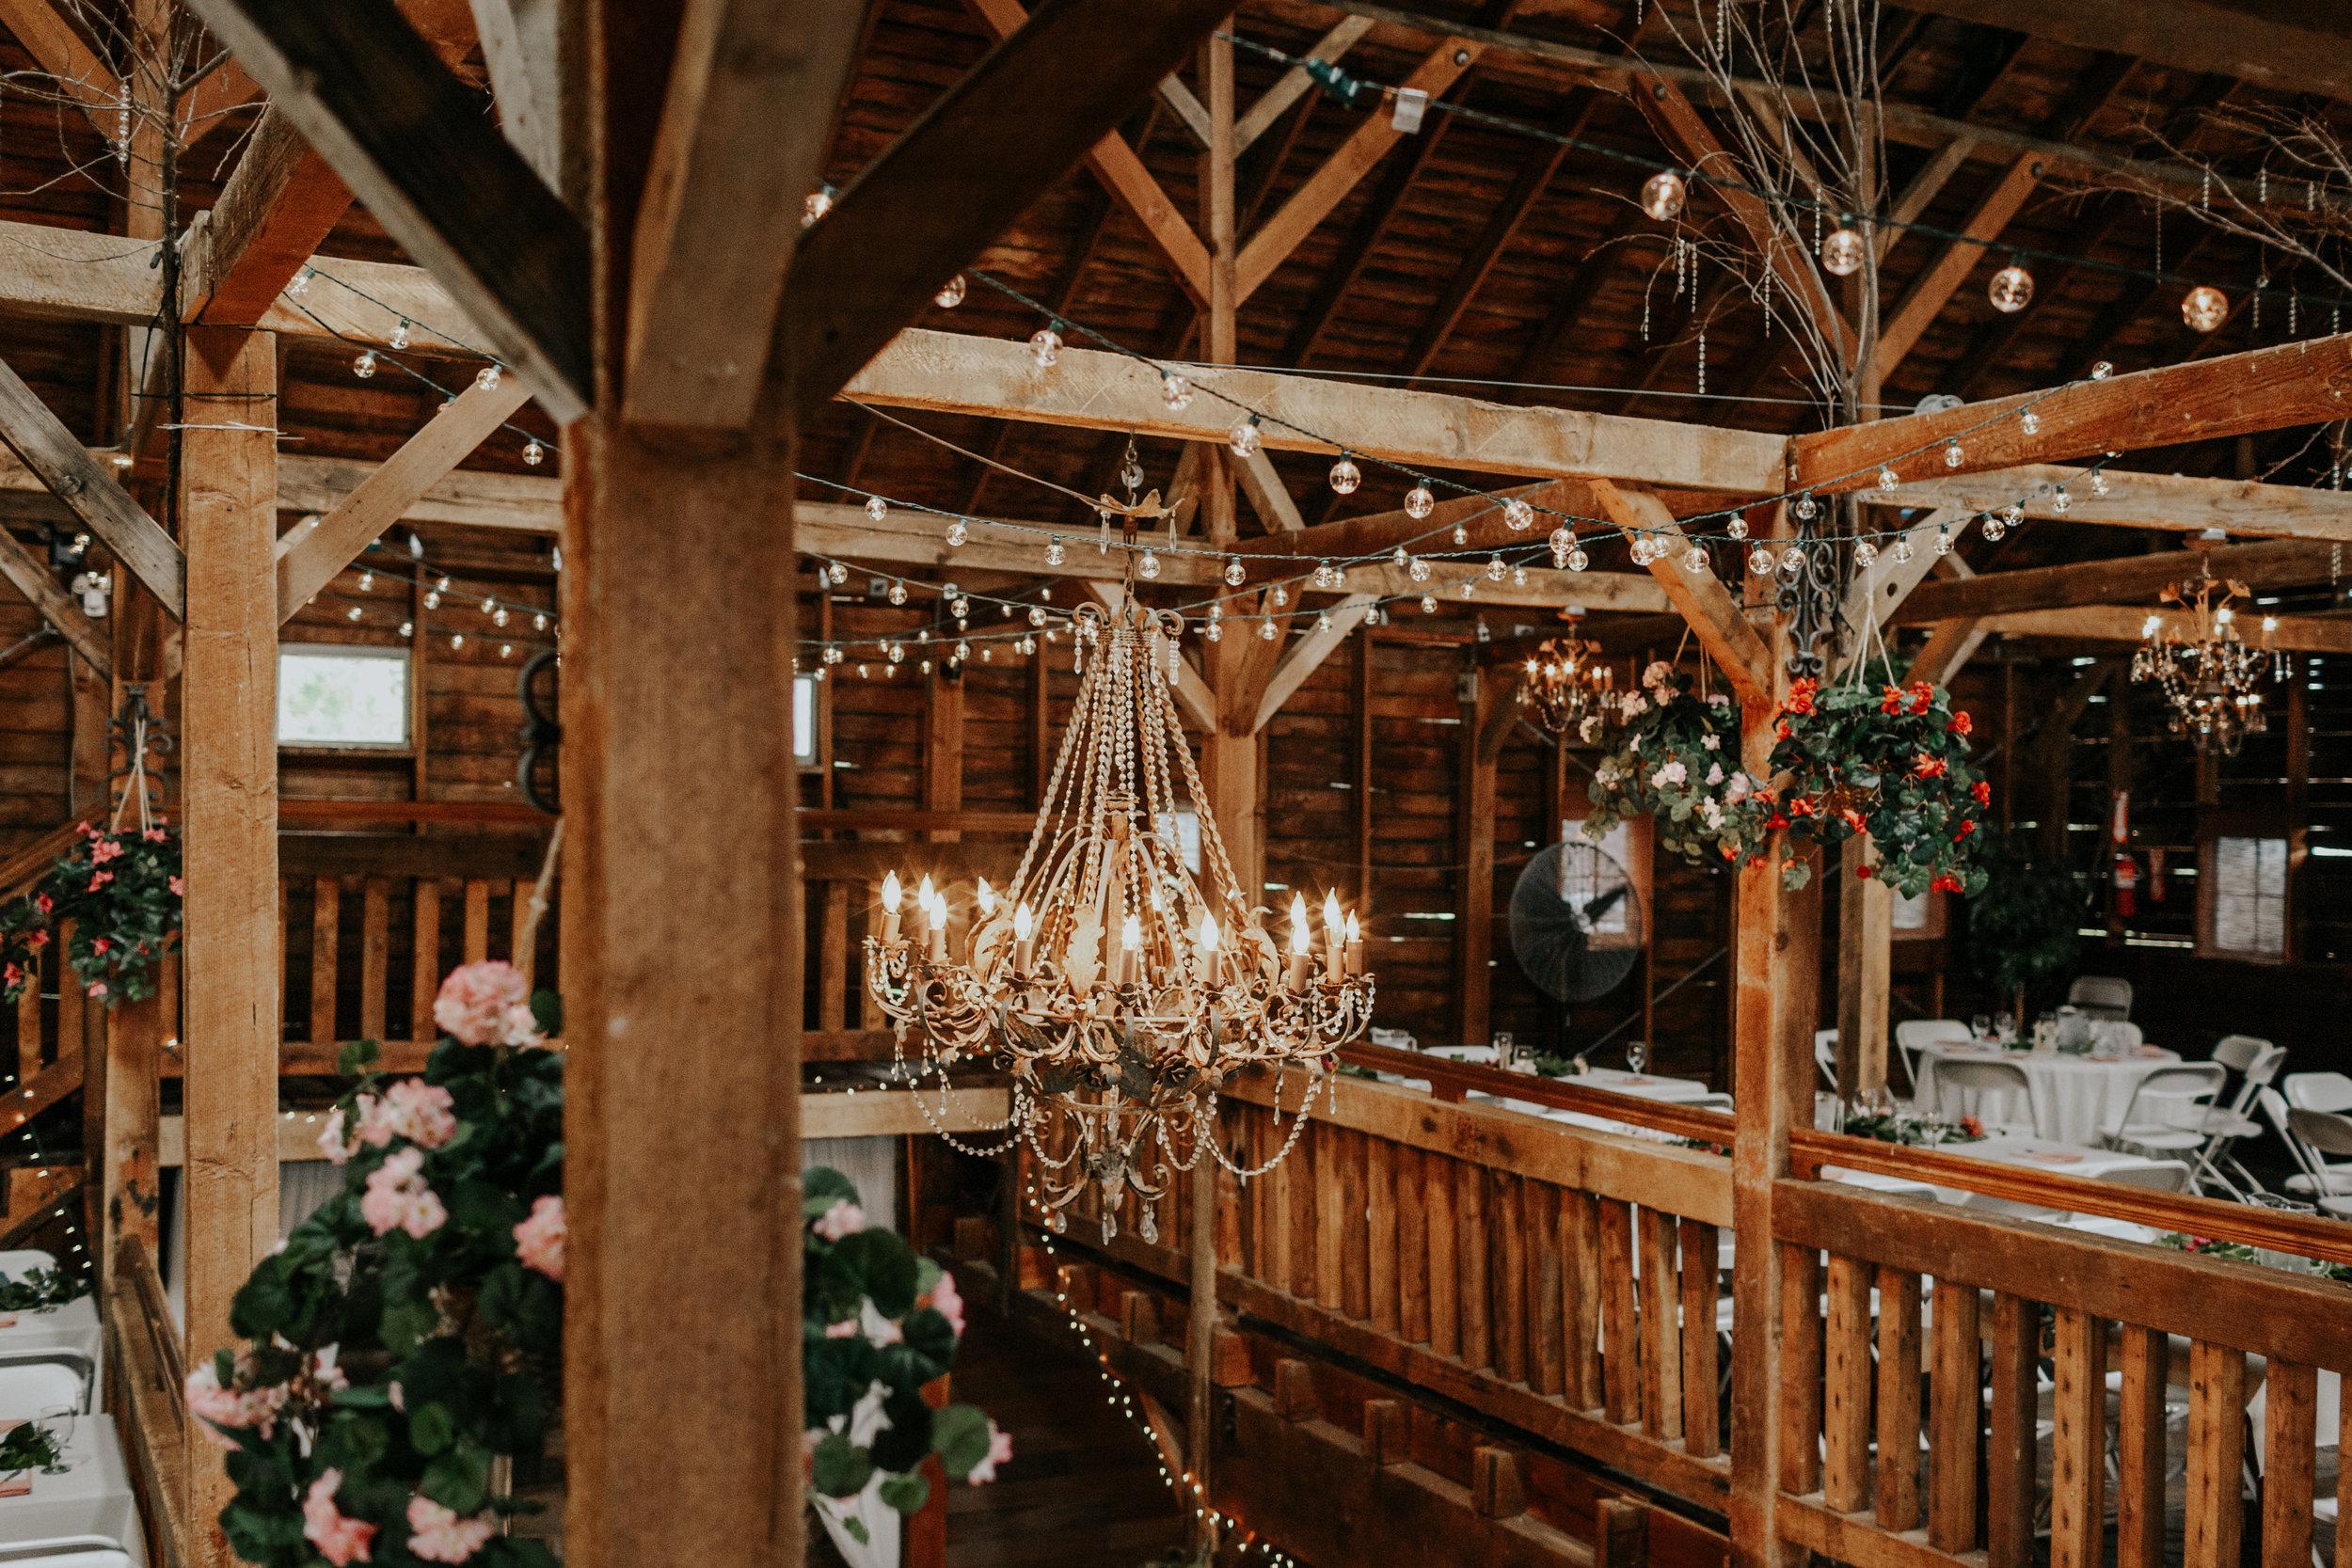 ginapaulson_jakitrevor_wedding-470.jpg